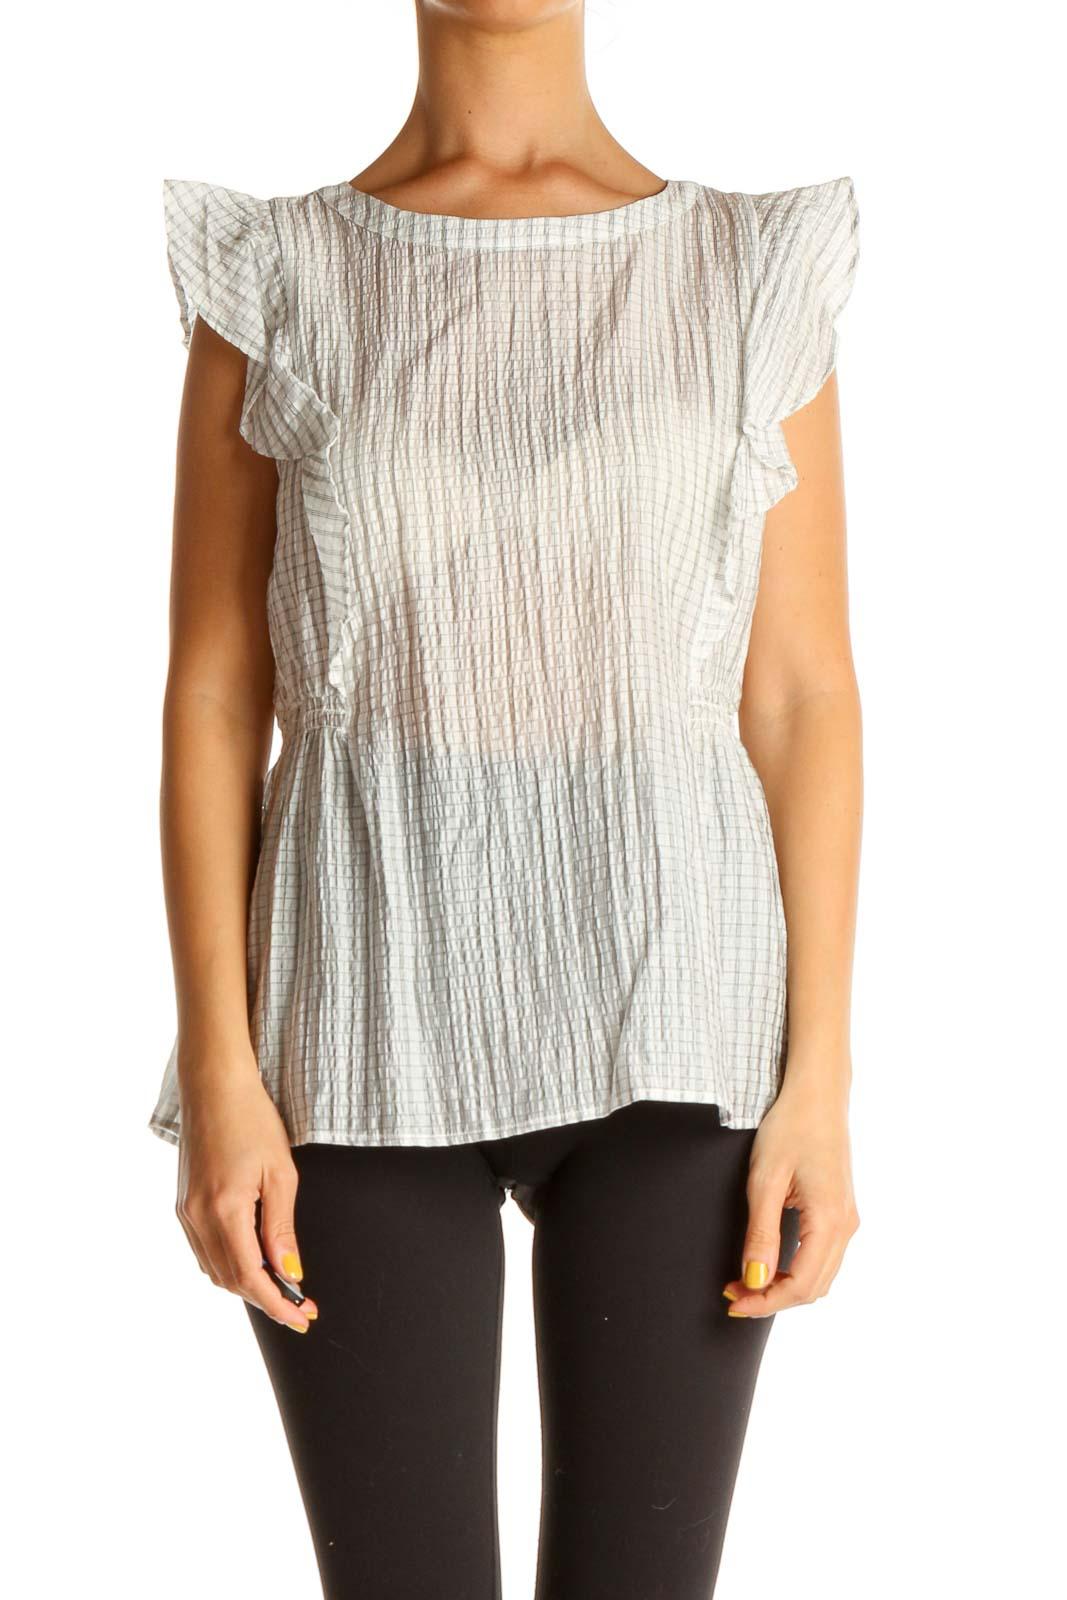 Gray Striped Retro Blouse Front